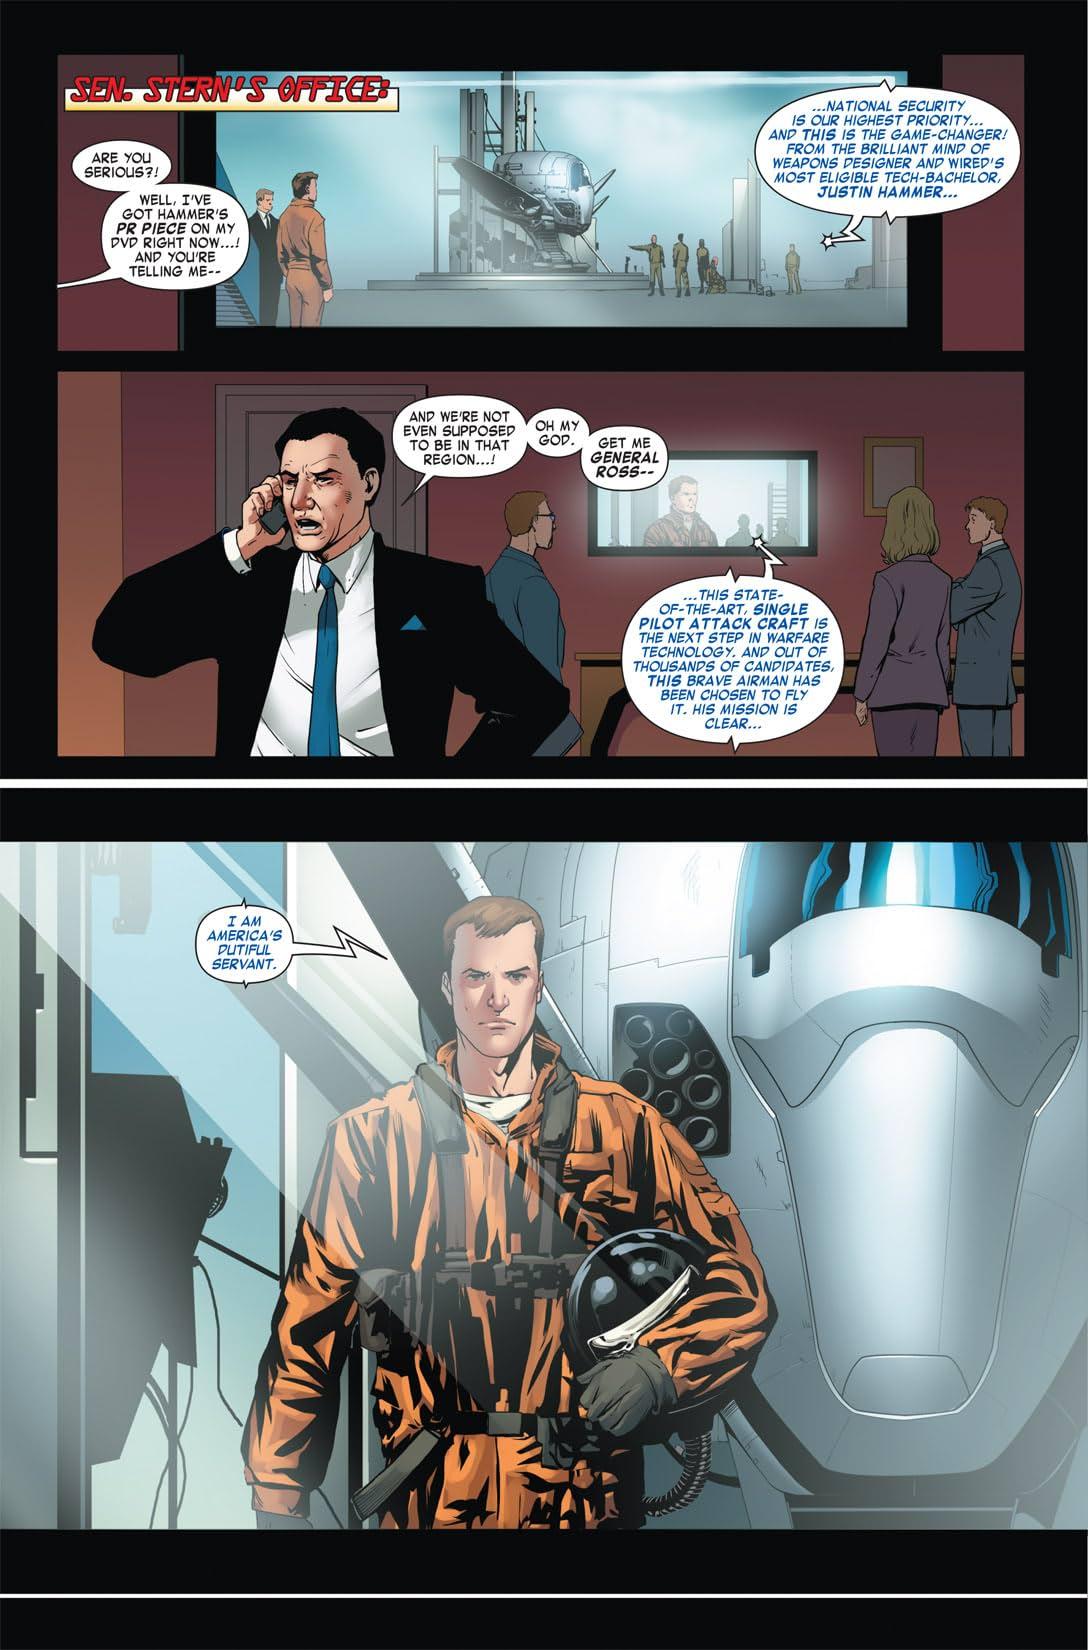 Iron Man 2: Public Identity #3 (of 3)